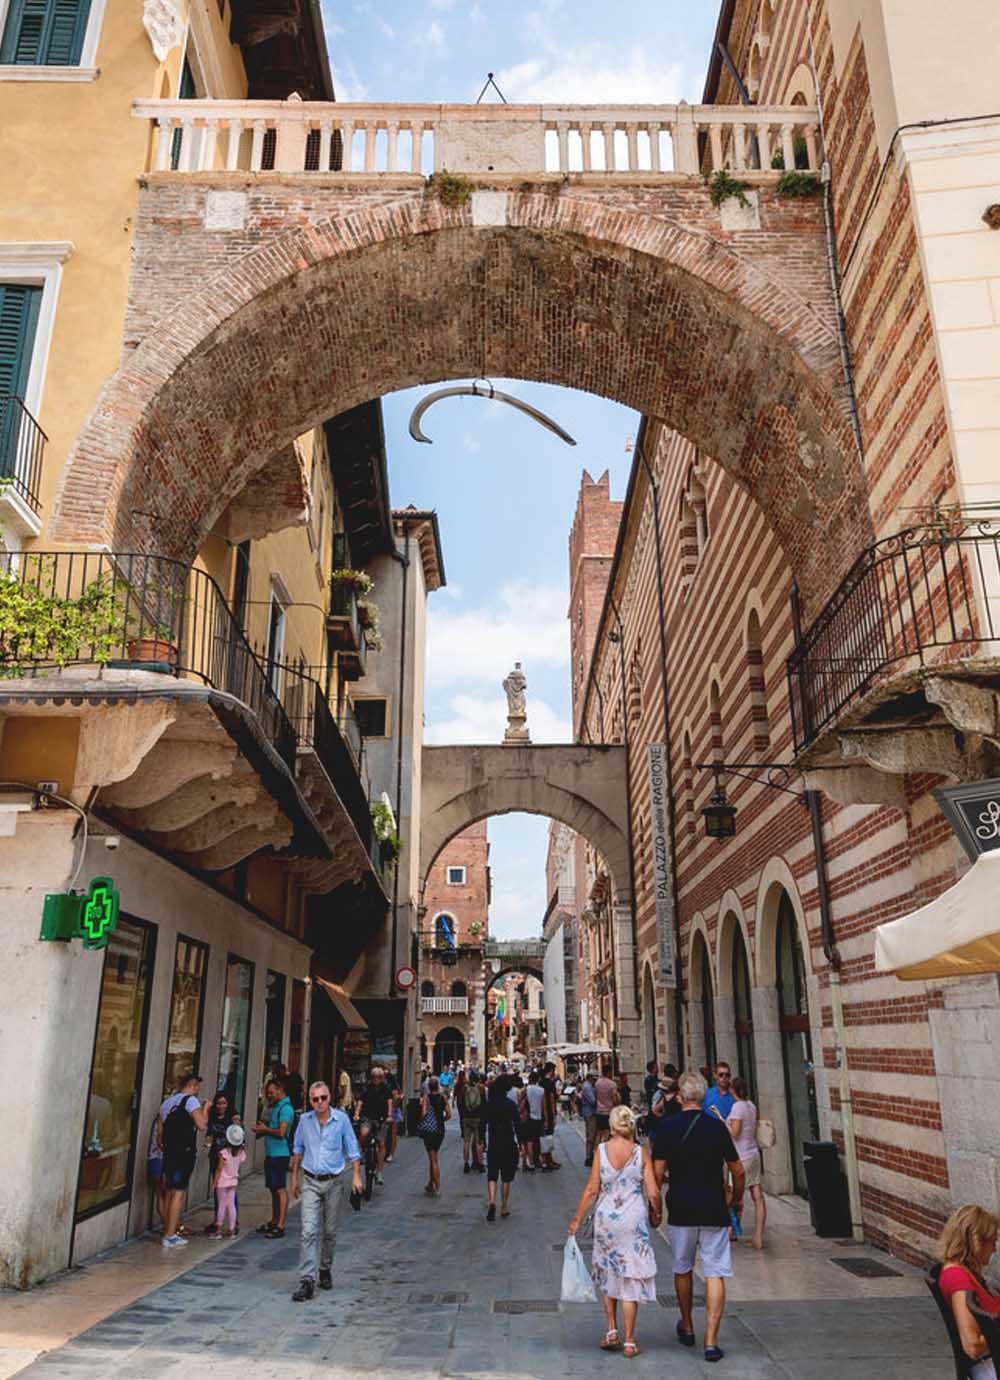 Tours - Medieval Verona - Captains Quarter (photo 2)